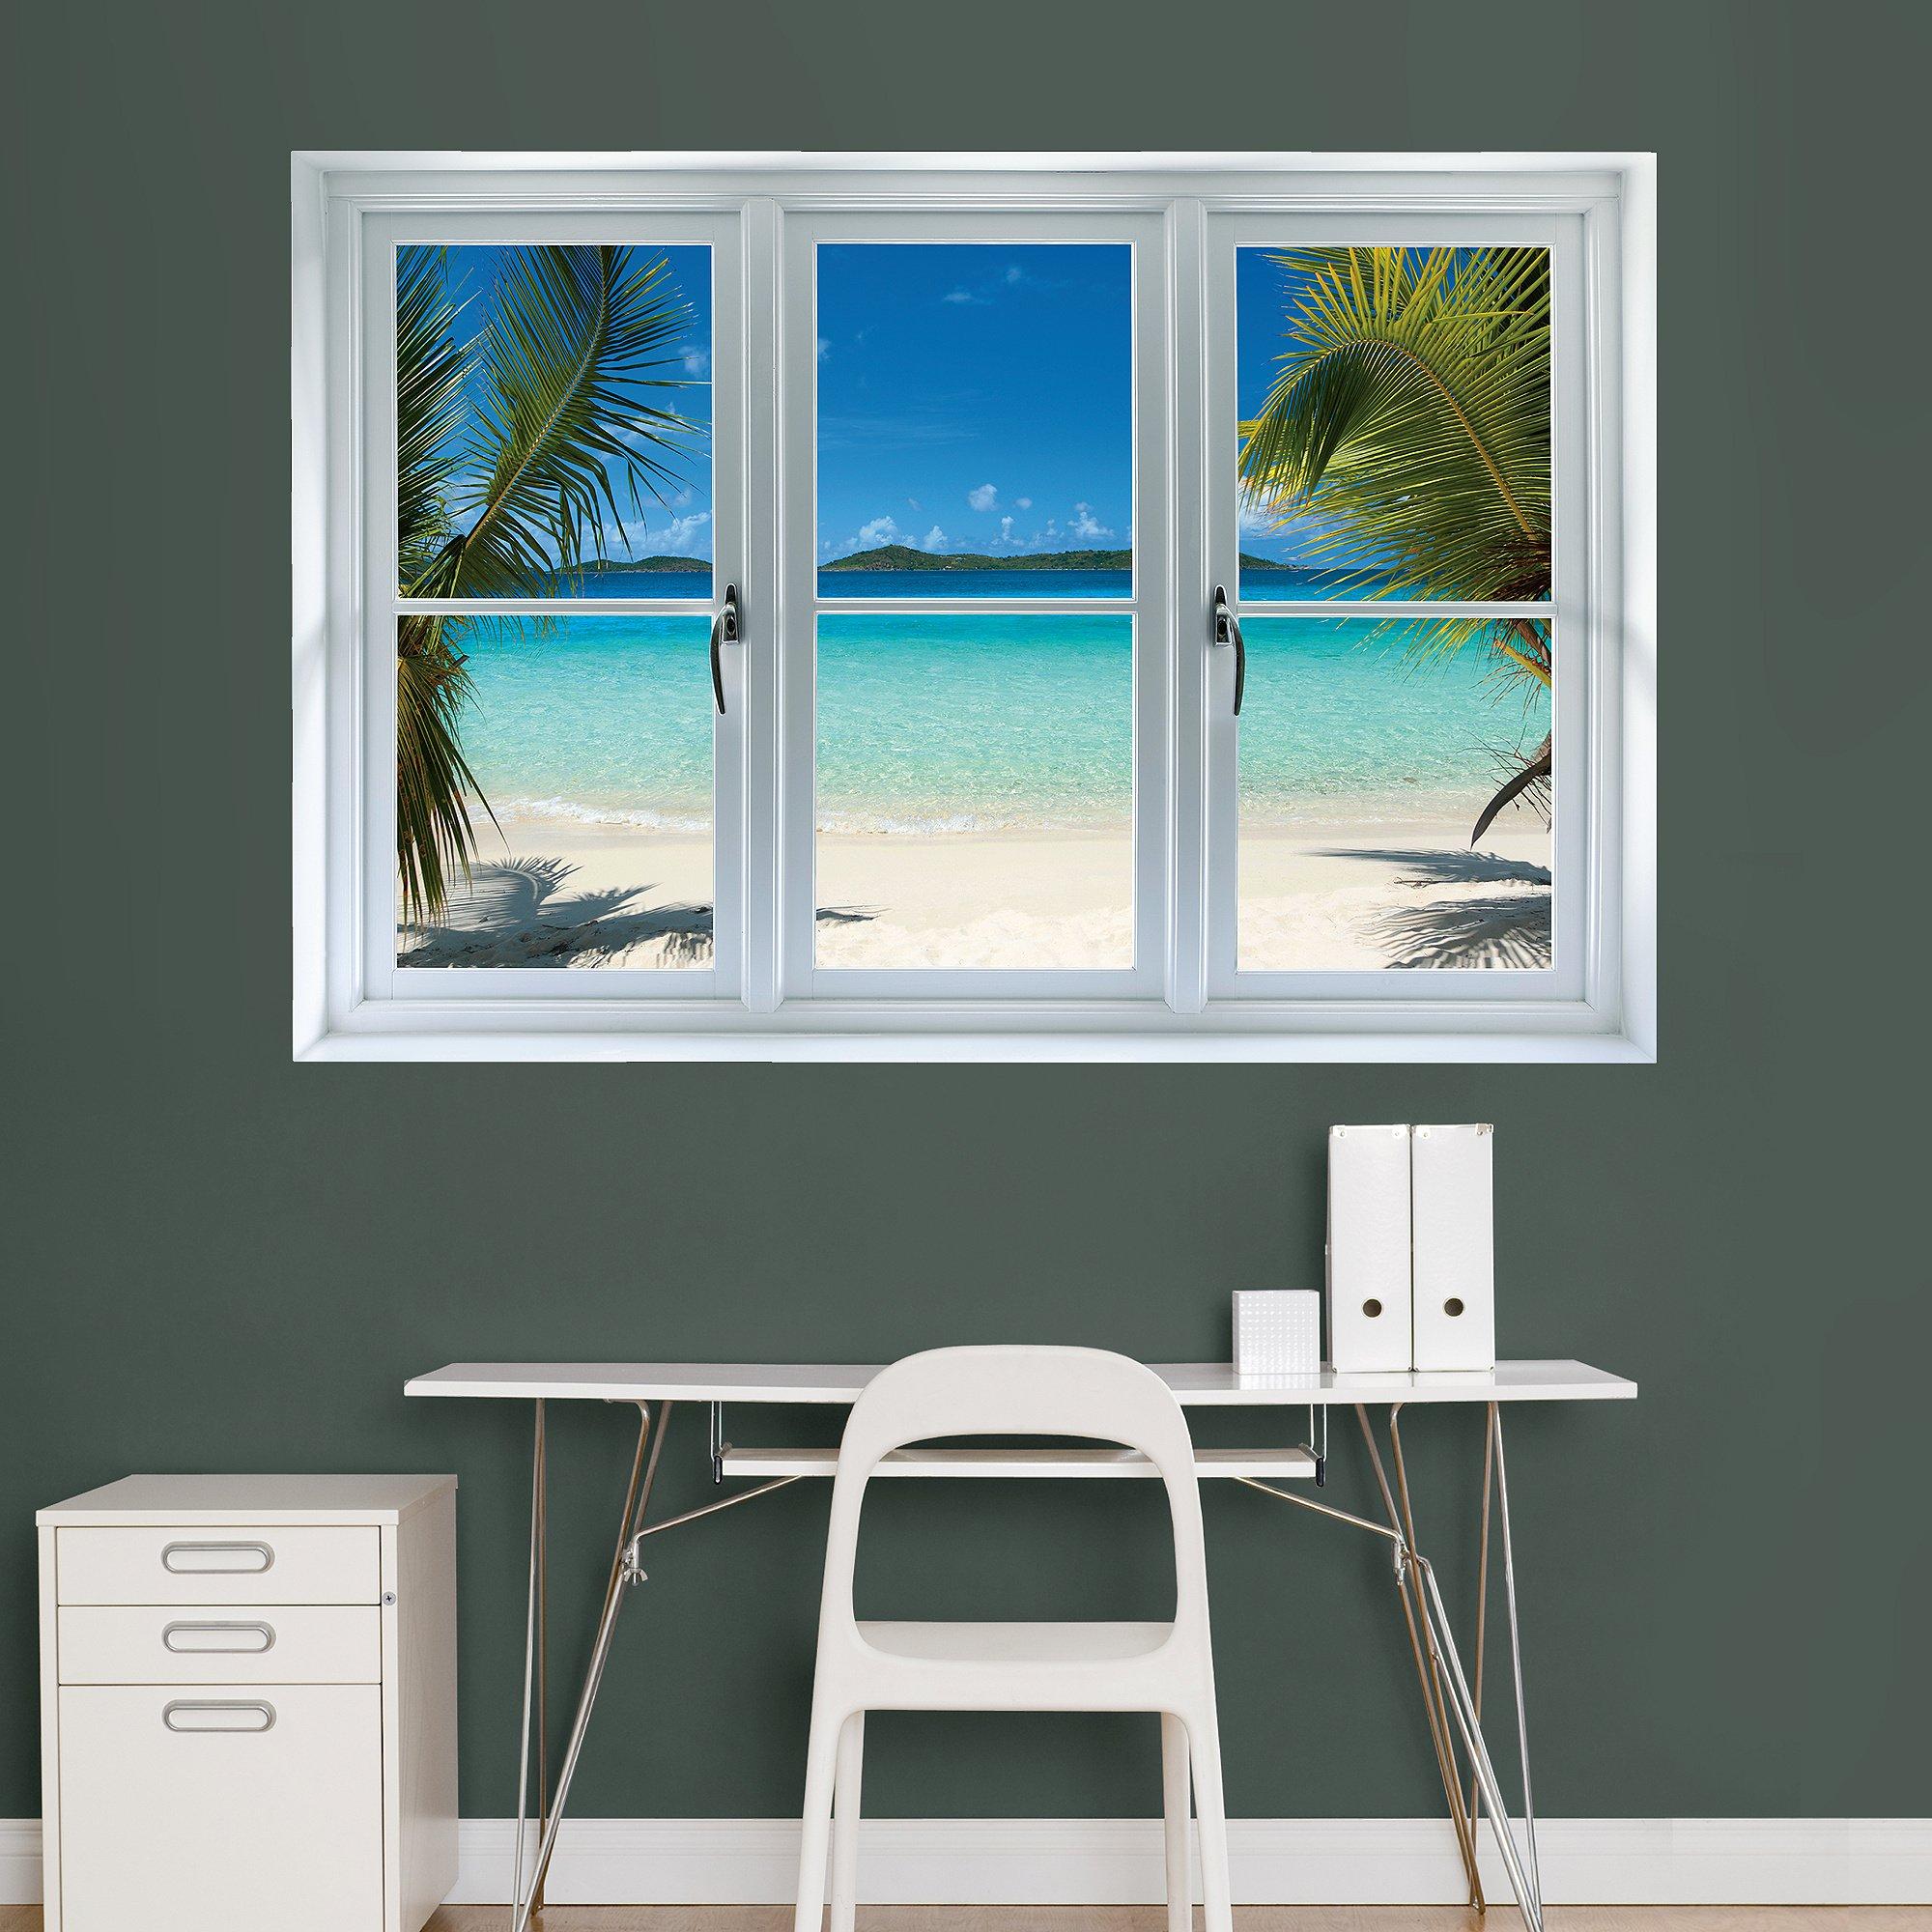 Fathead Wall Decal, ''Virgin Islands Beach Scenic Window''